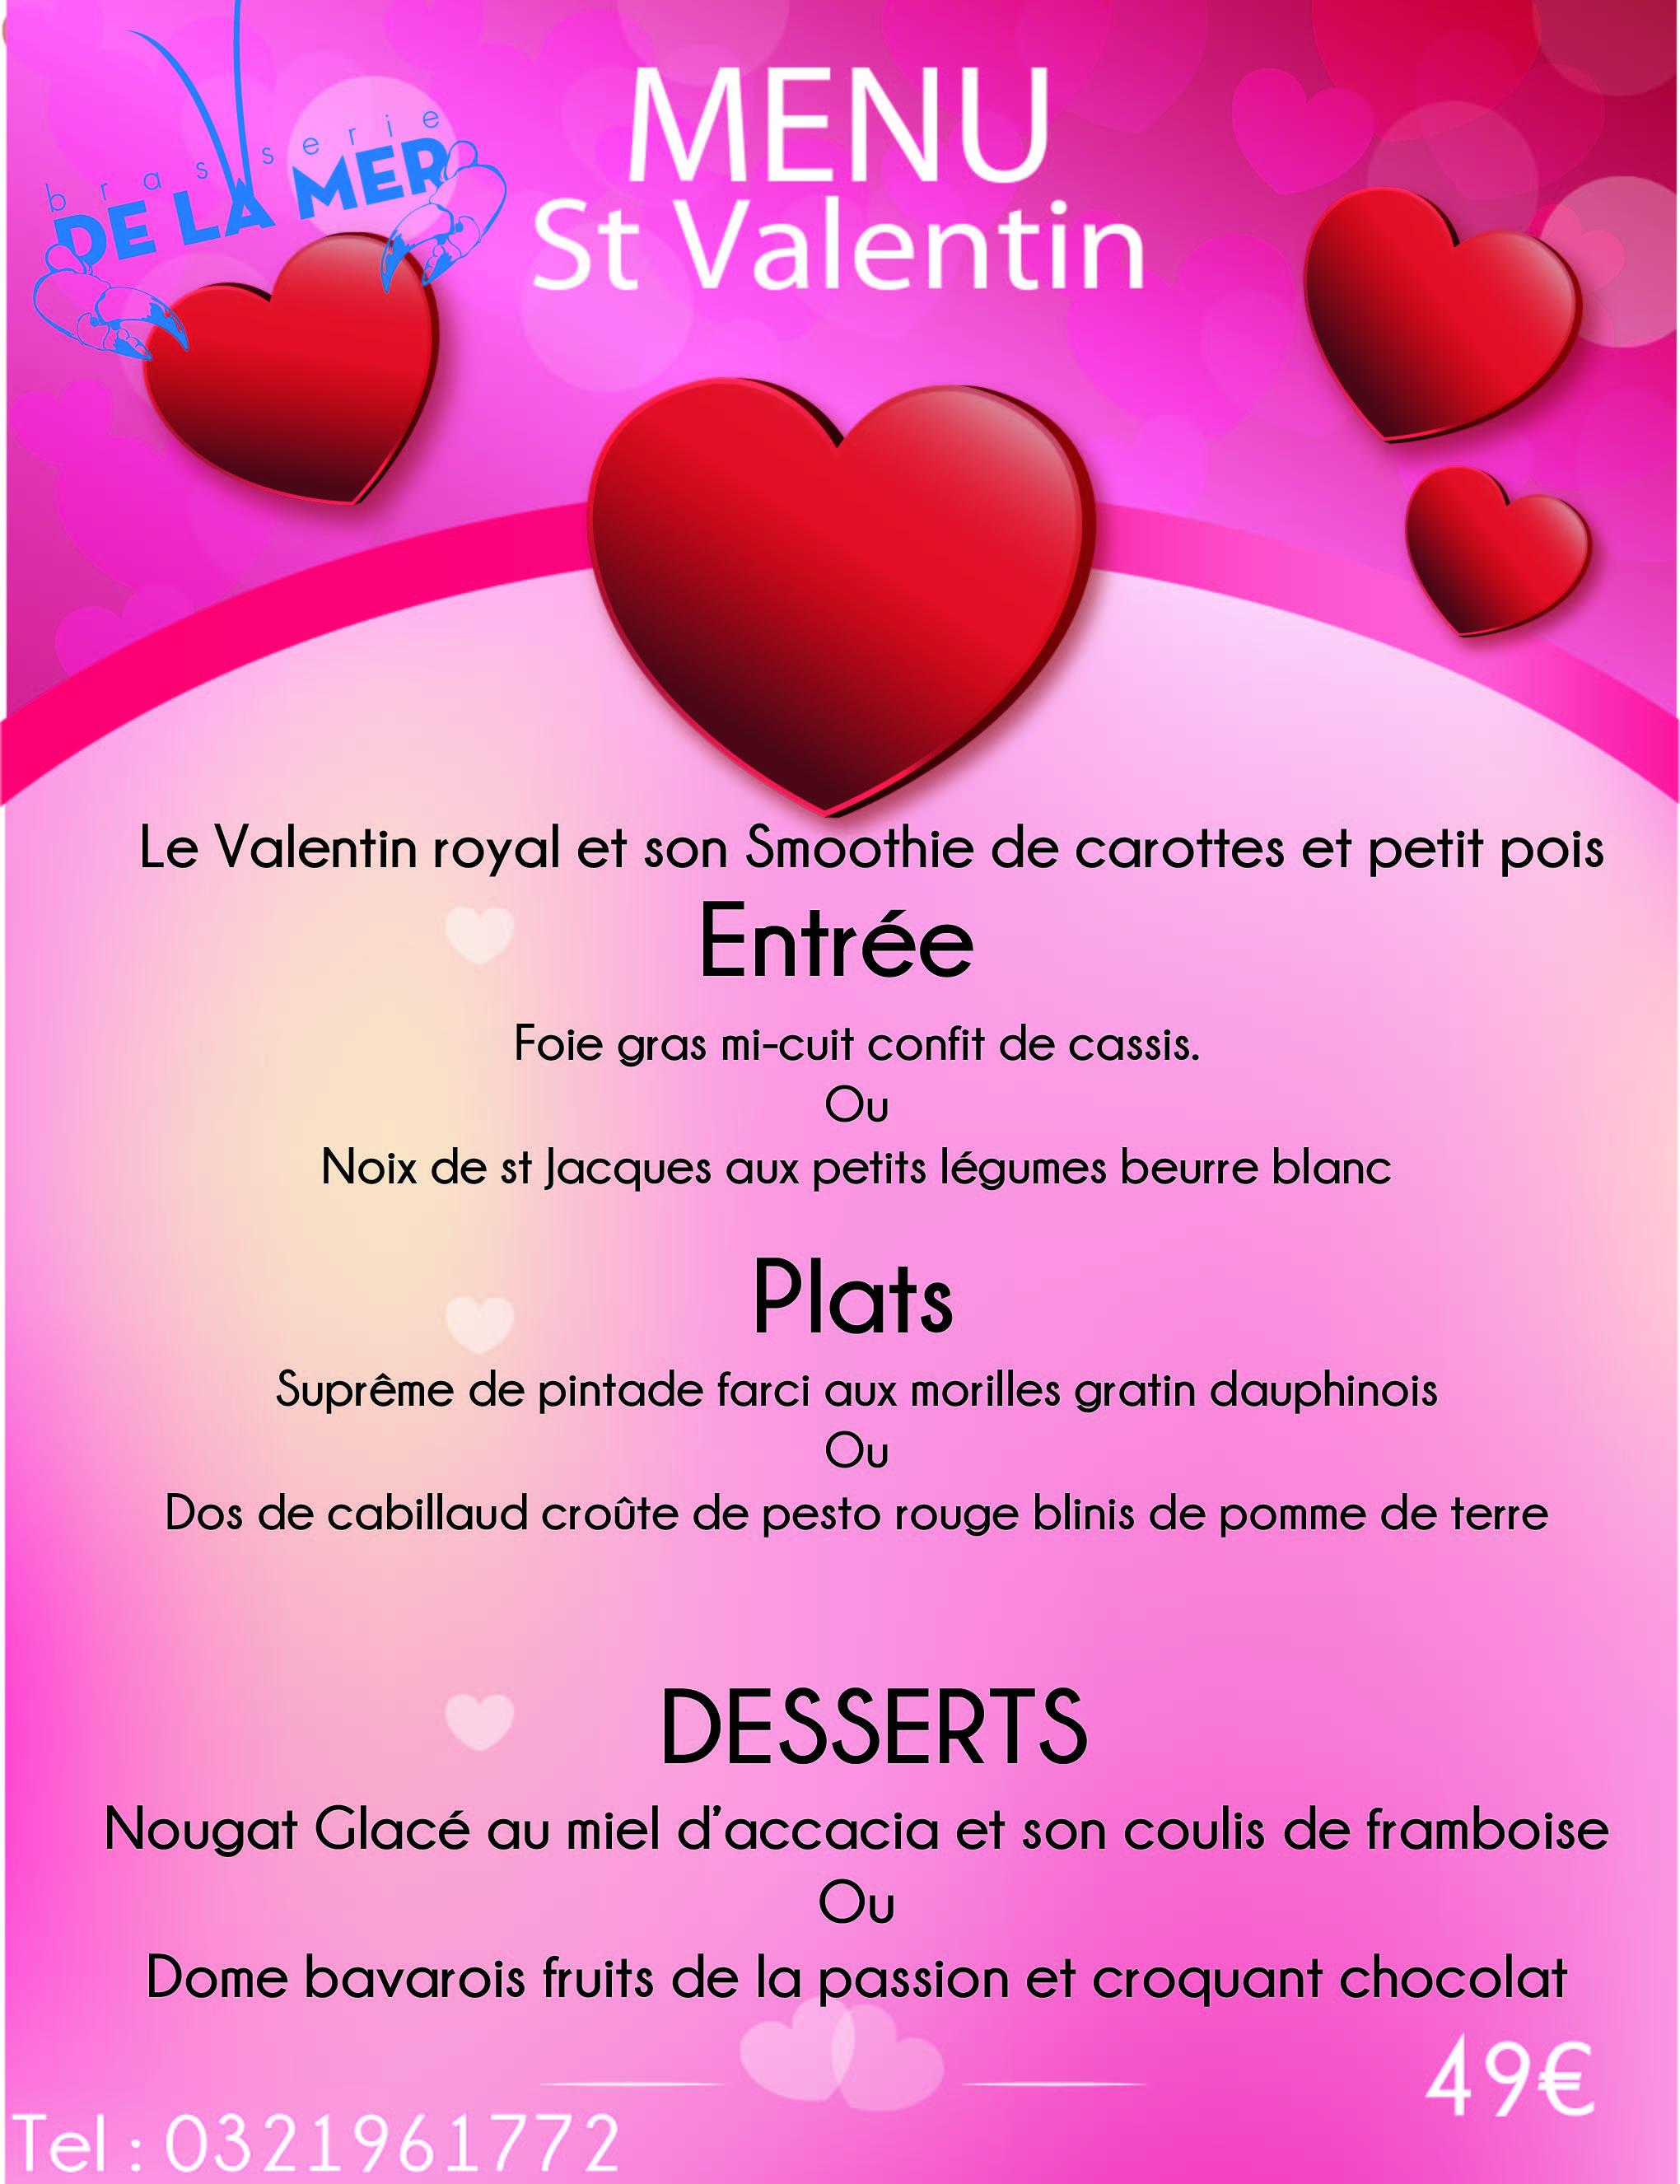 menu-de-st-valentin-2018-01